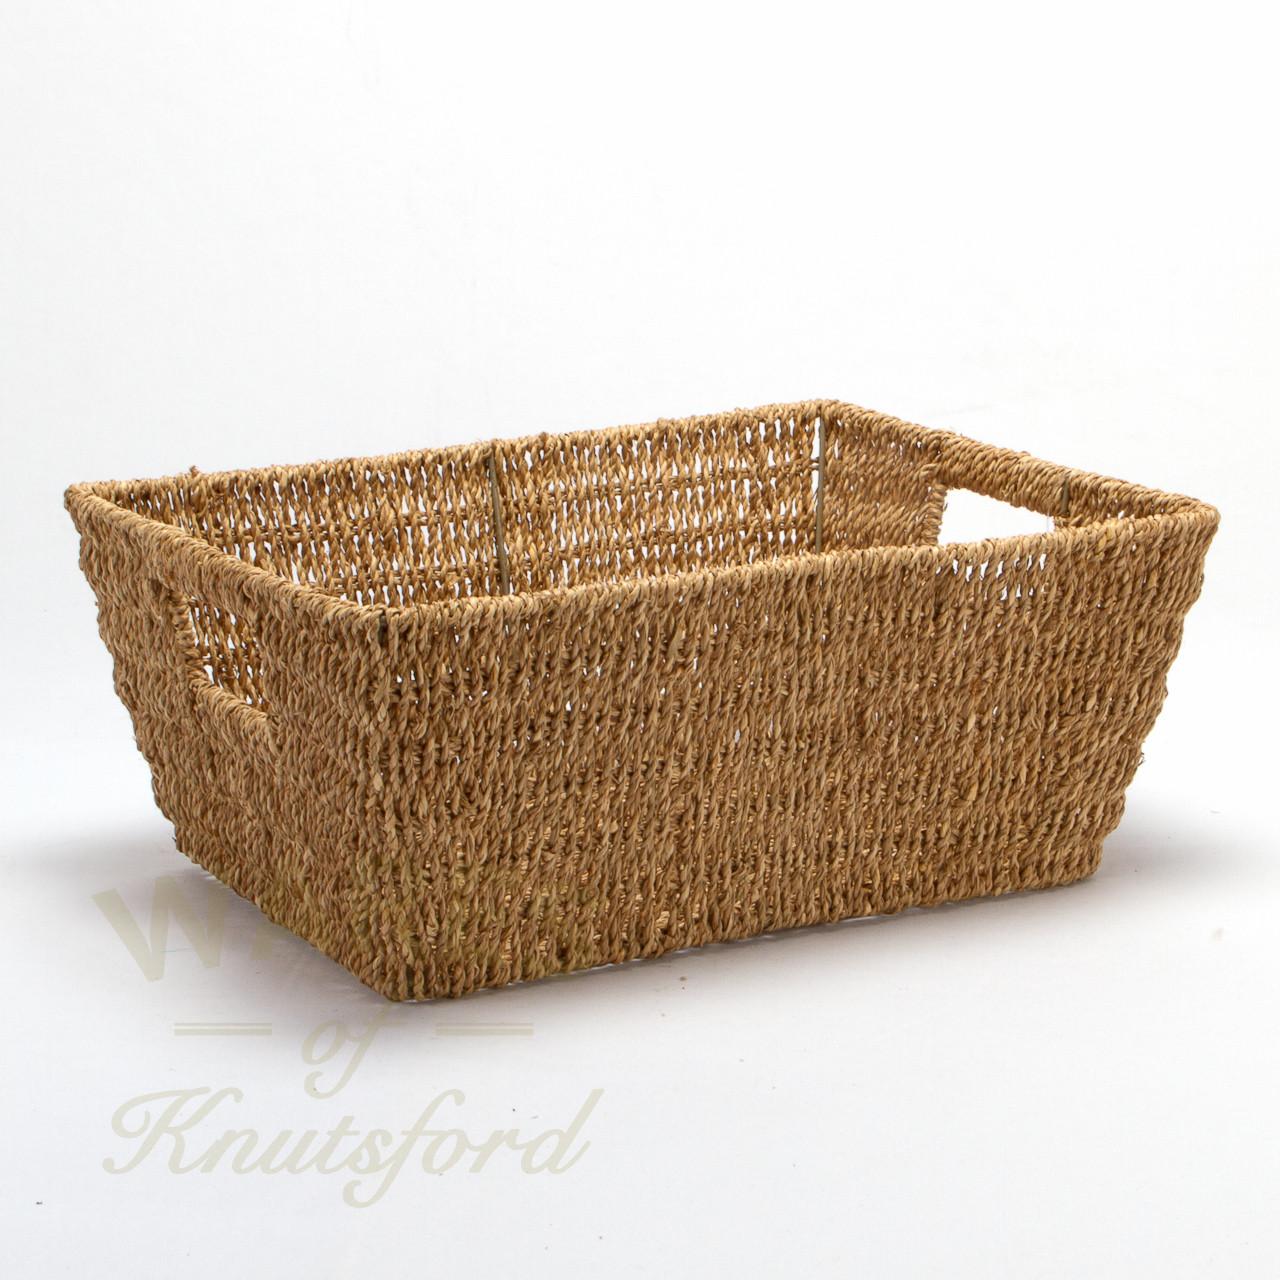 sea grass baskets